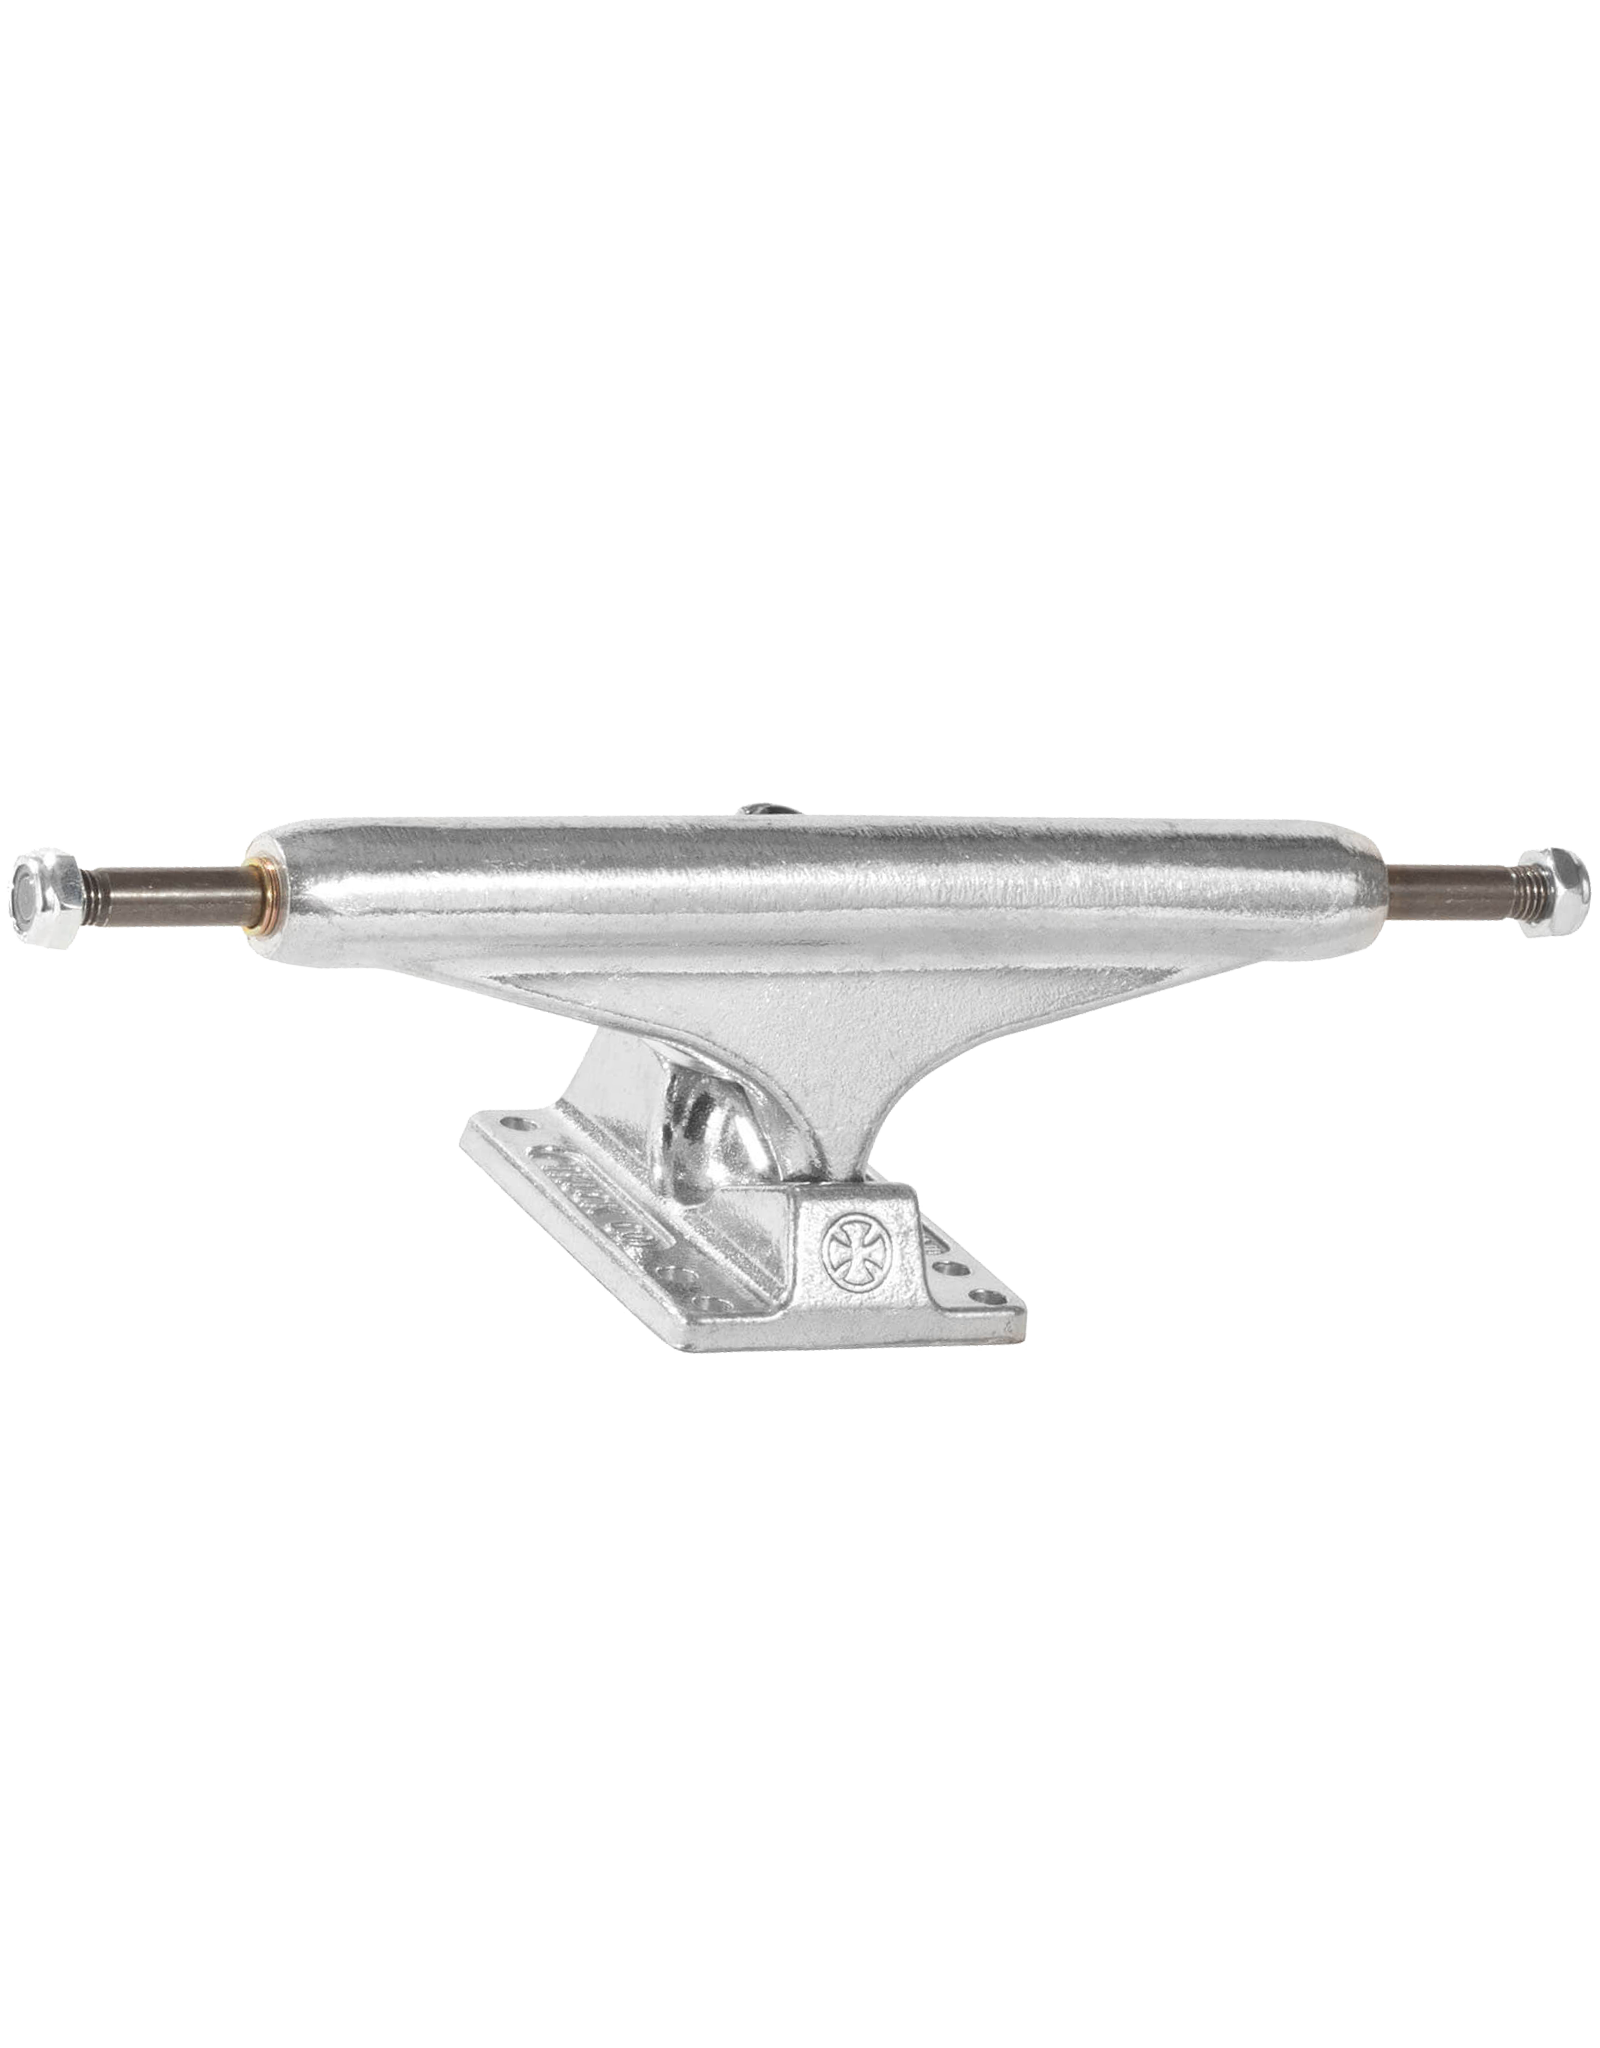 Independent STD 159mm SILVER TRUCK